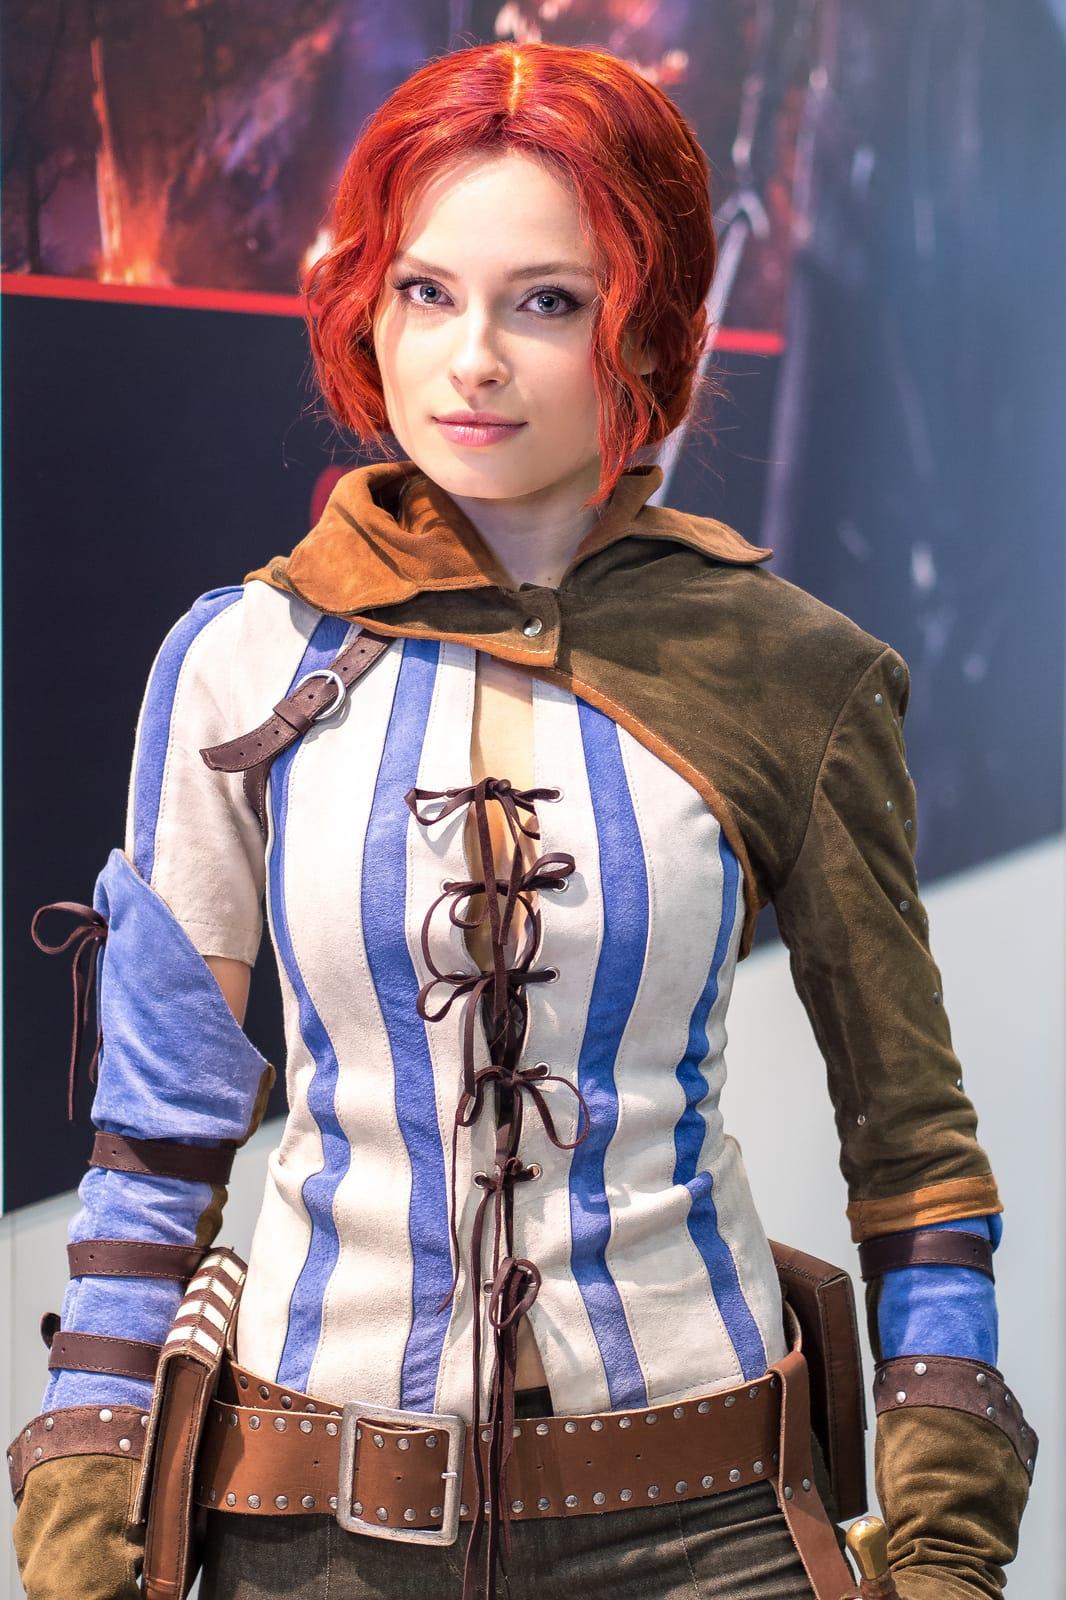 Triss merigold cosplay adult tube